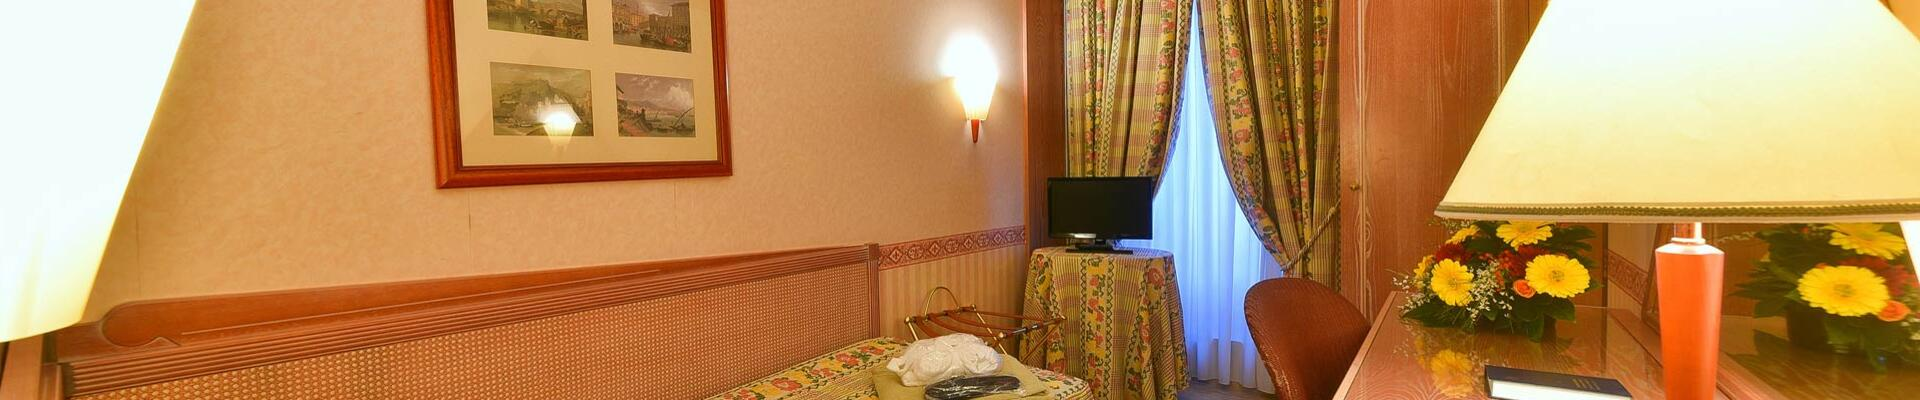 hotelreferdinandoischia it camere-singole 004